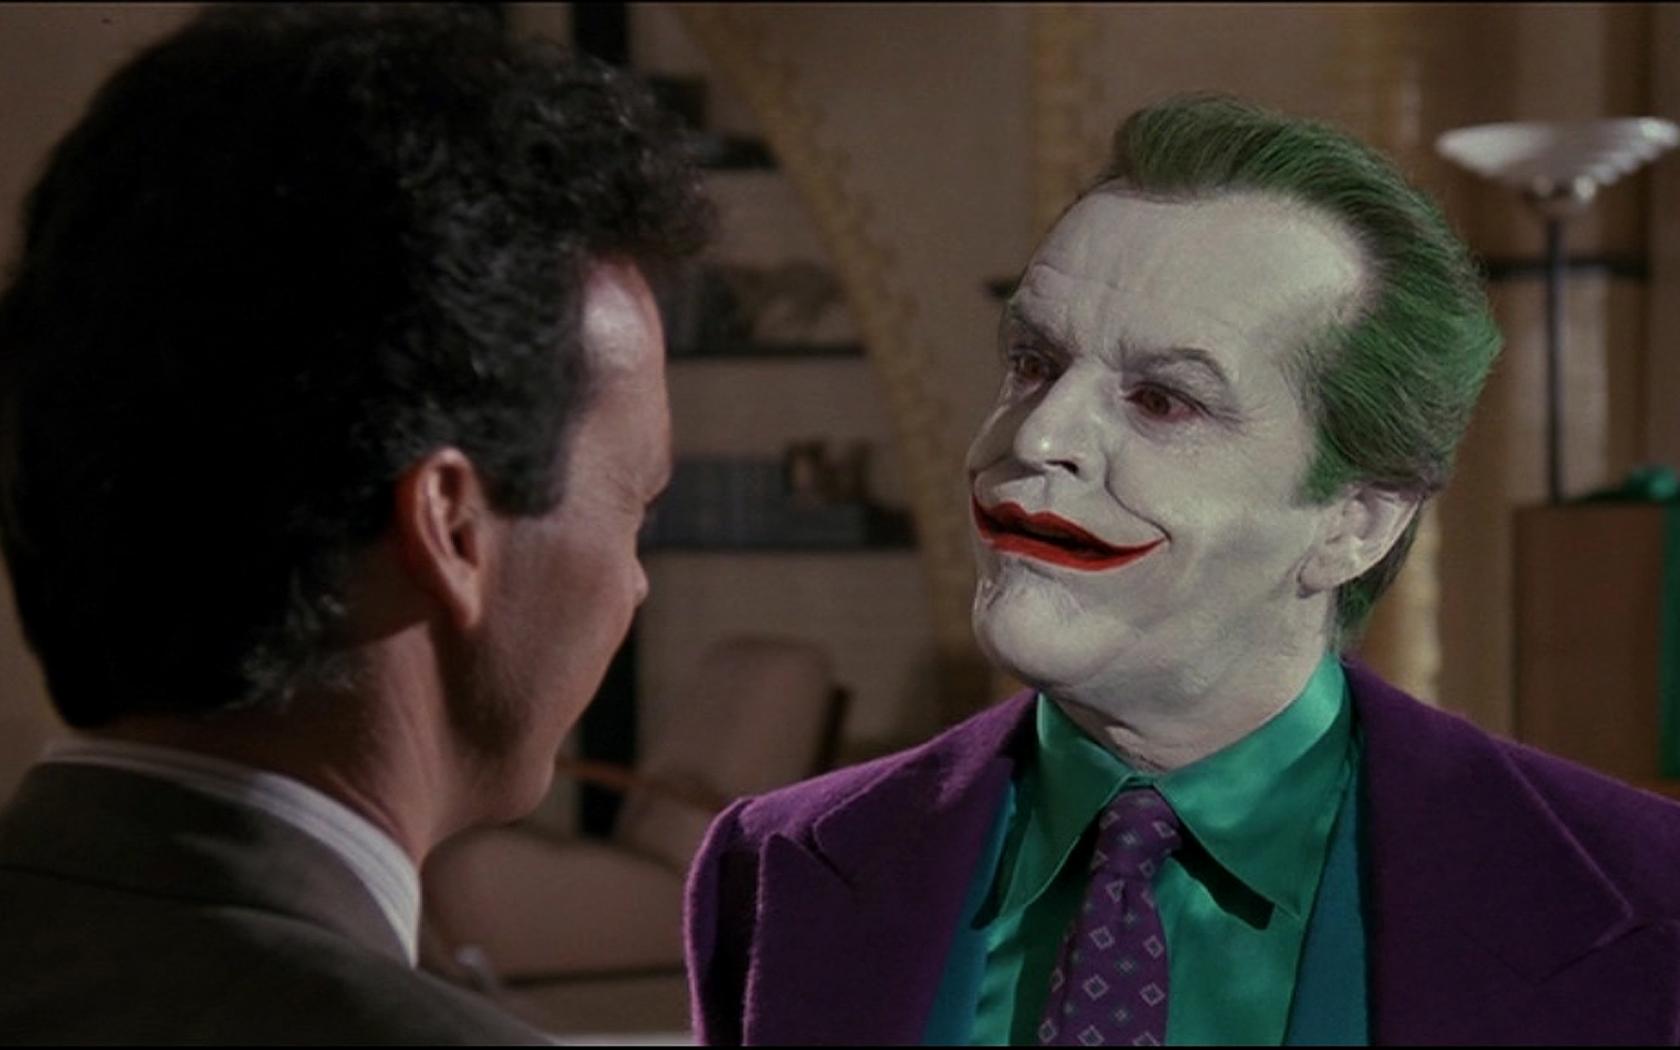 Bruce Wayne And The Joker Wallpaper » Bruce Wayne And The Joker Wallpaper